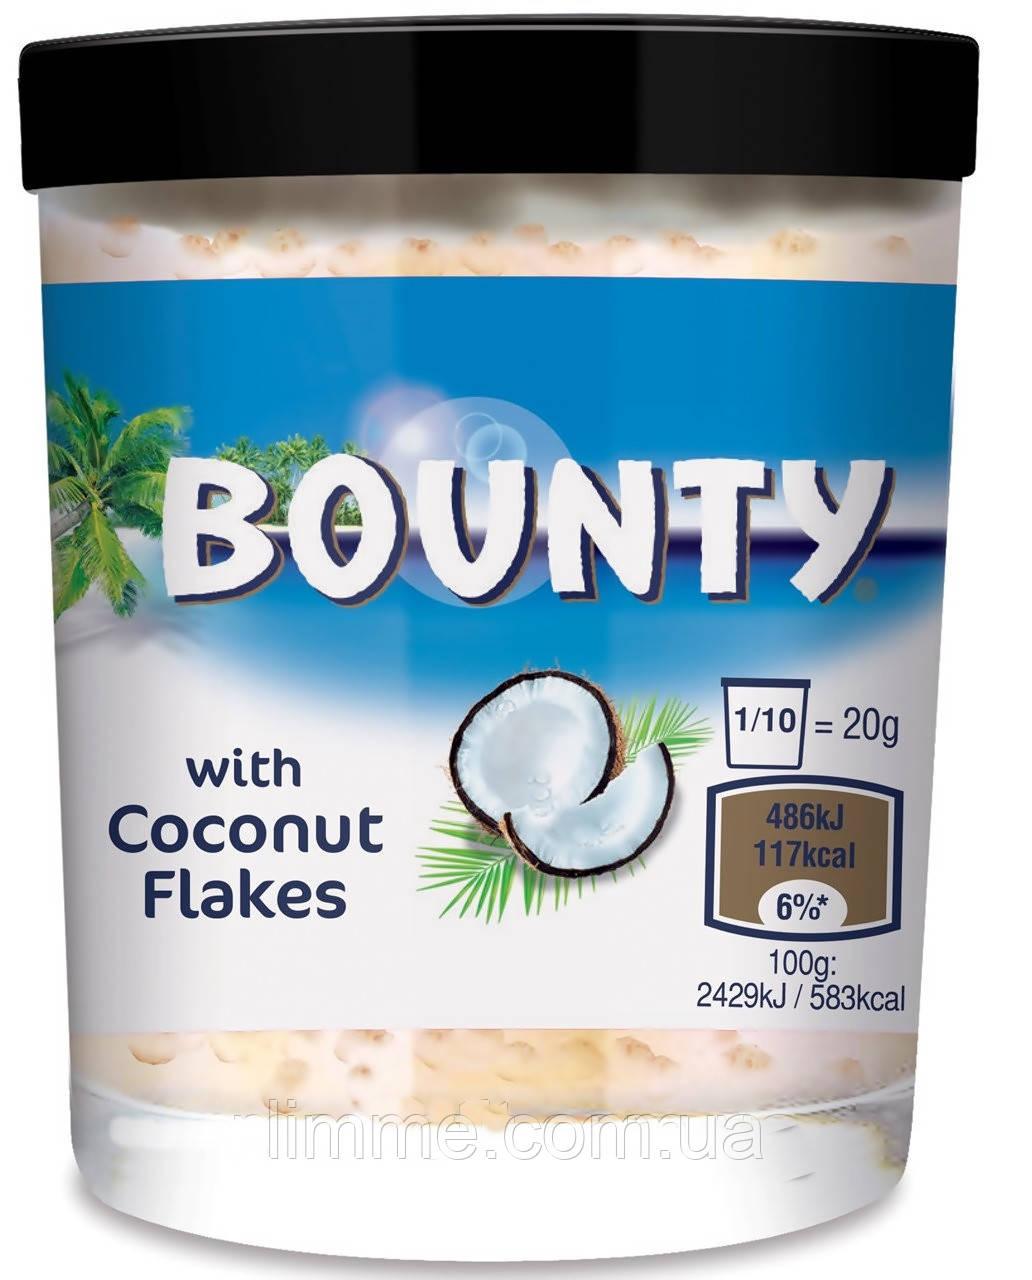 Шоколадная паста Bounty with coconut flakes 200 г